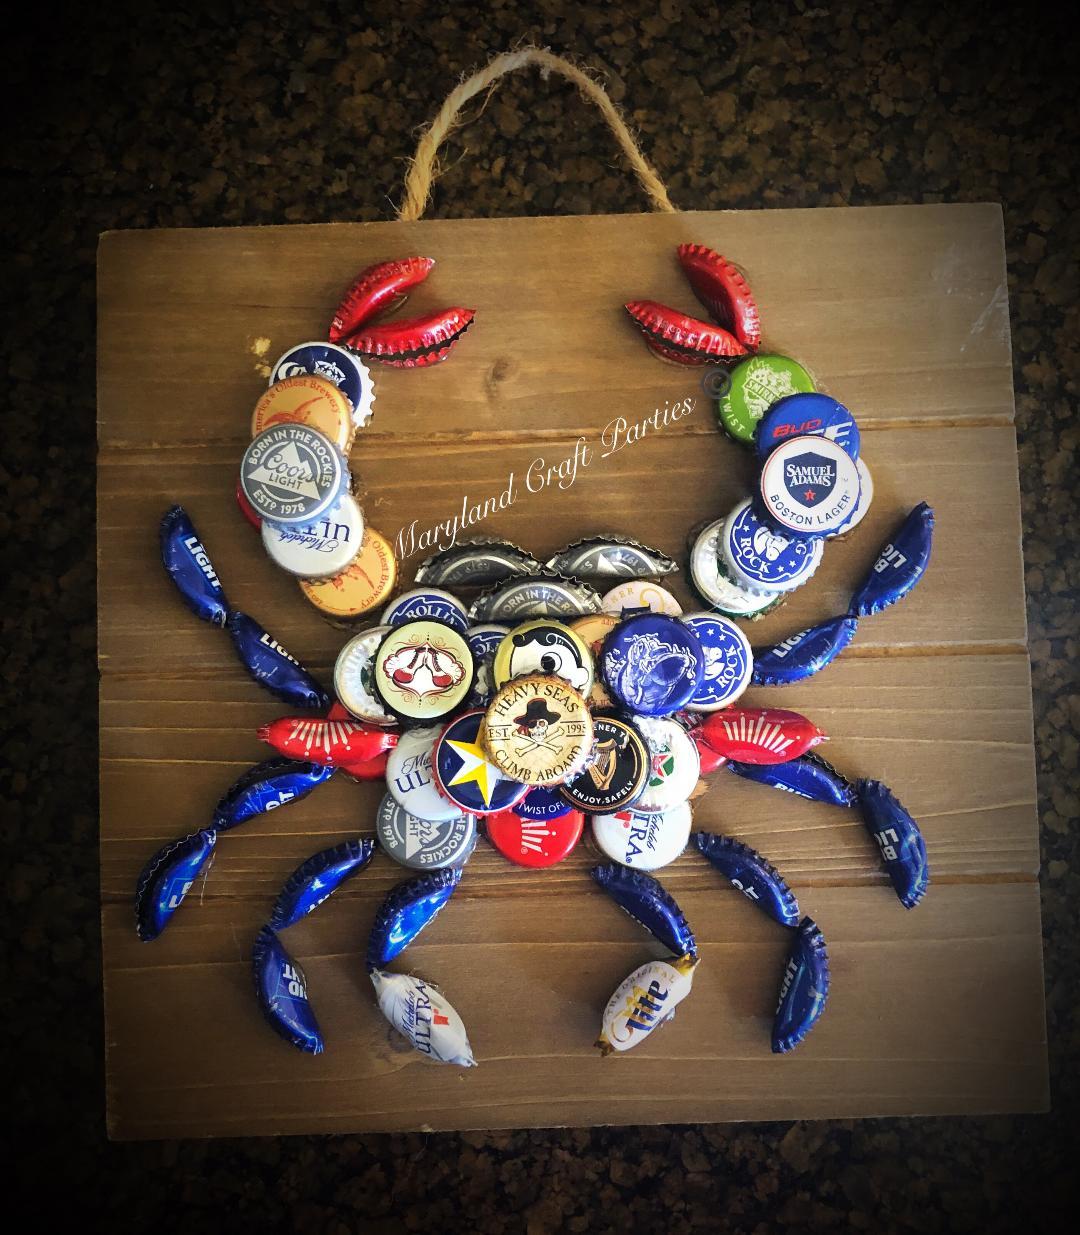 bottle cap crab Maryland craft parties